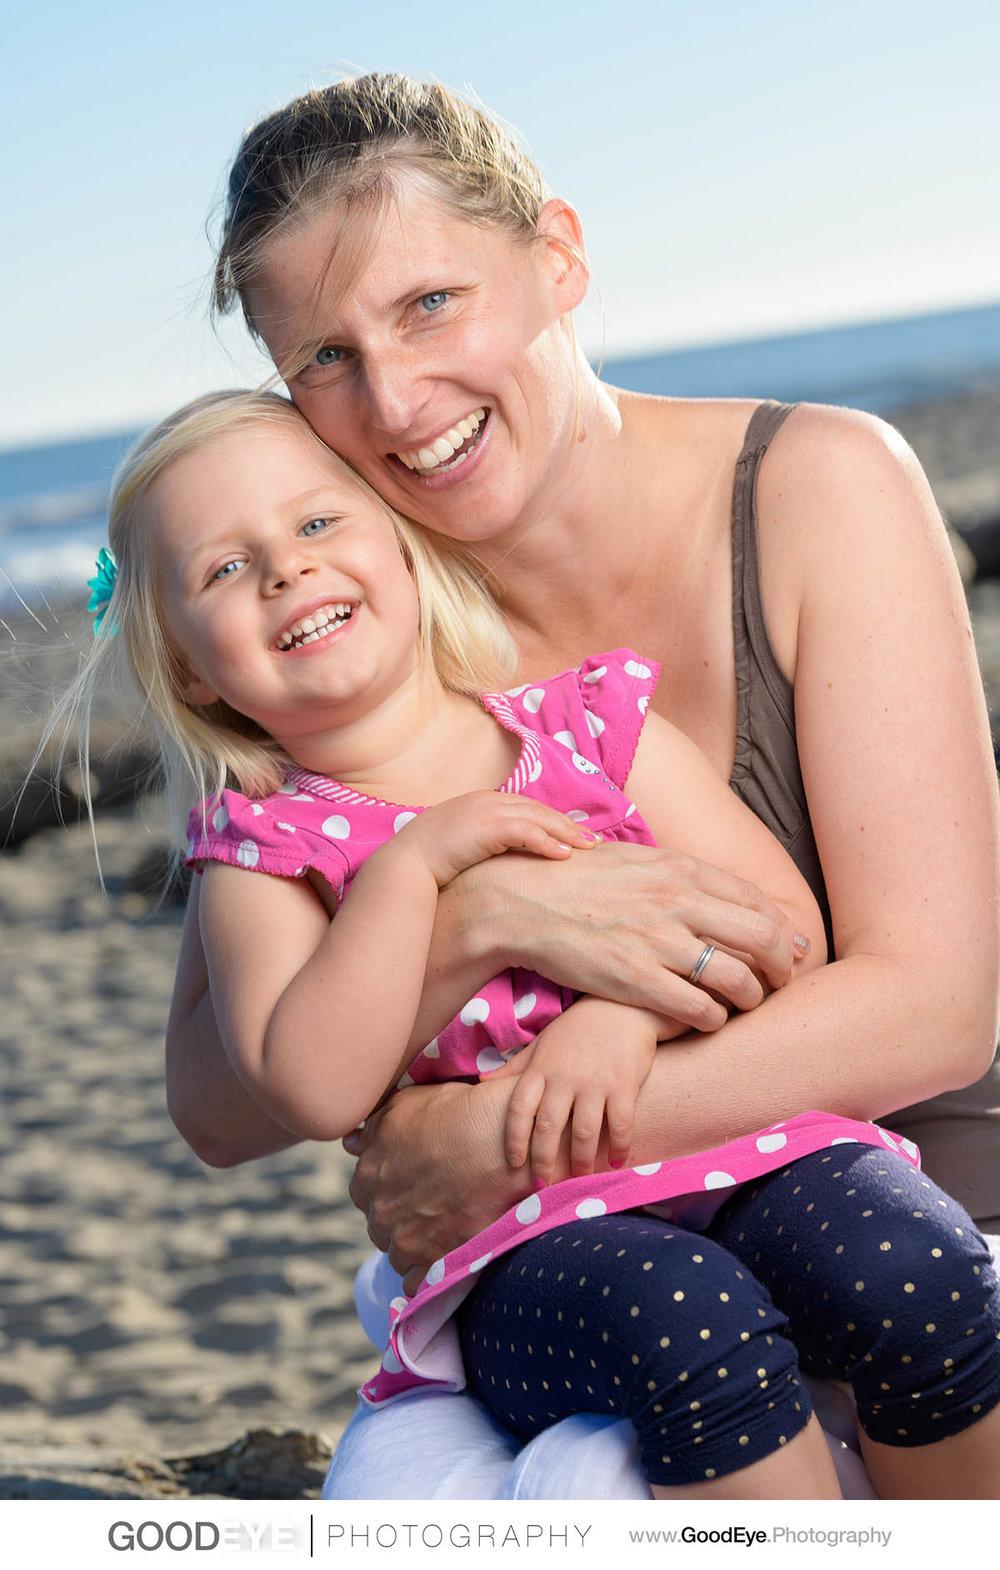 7609_Maja_and_Justin_Twin_Lakes_Beach_Santa_Cruz_Newborn_Family_Photogrraphy.jpg